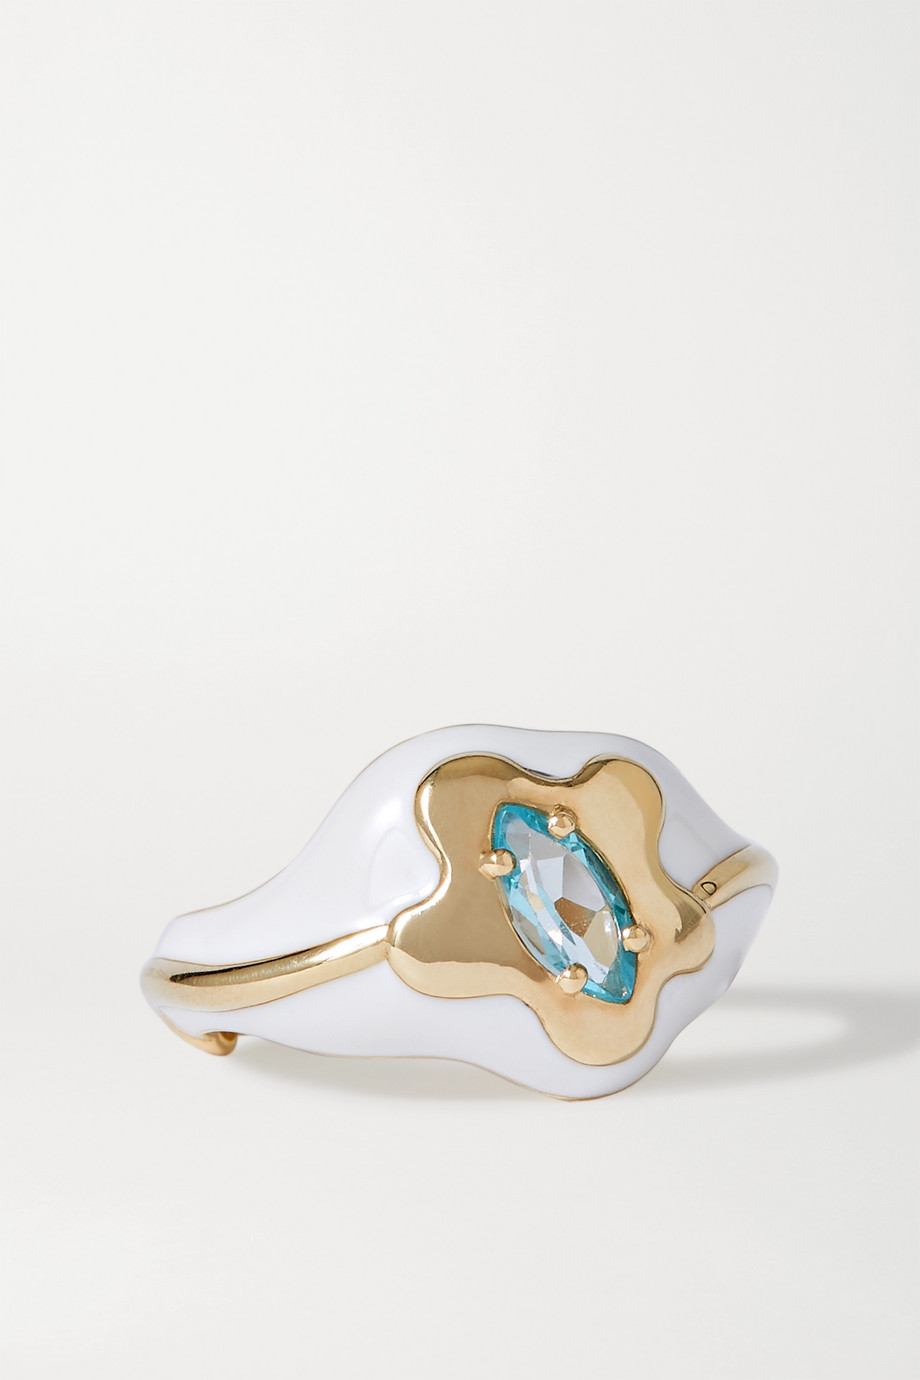 Bea Bongiasca 9K 黄金、搪瓷、托帕石戒指